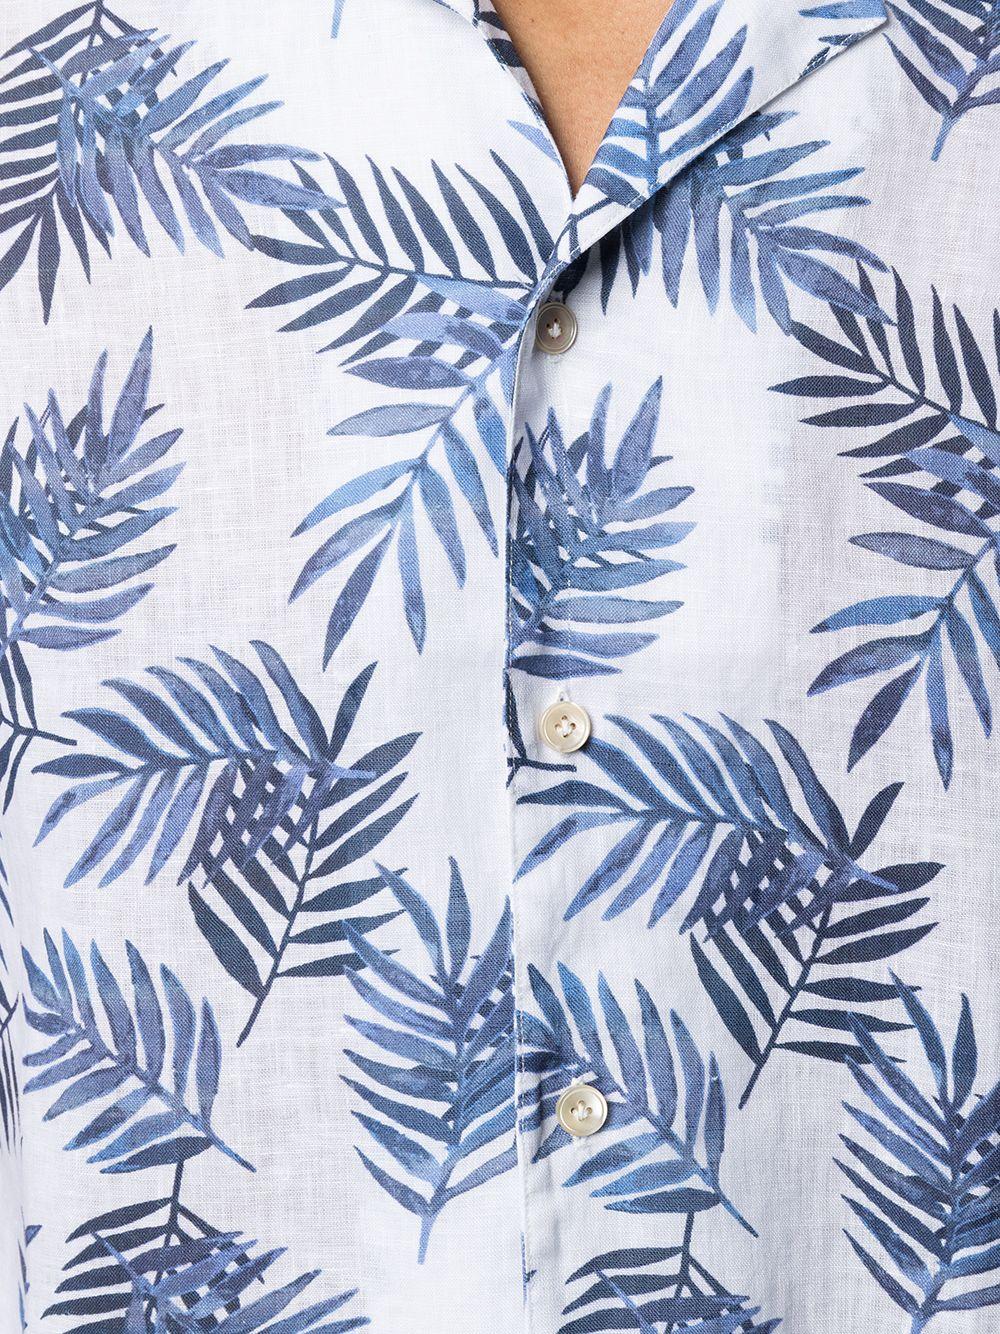 White and blue linen palm leaf print shirt   ELEVENTY |  | C75CAMC07-TES0C02711